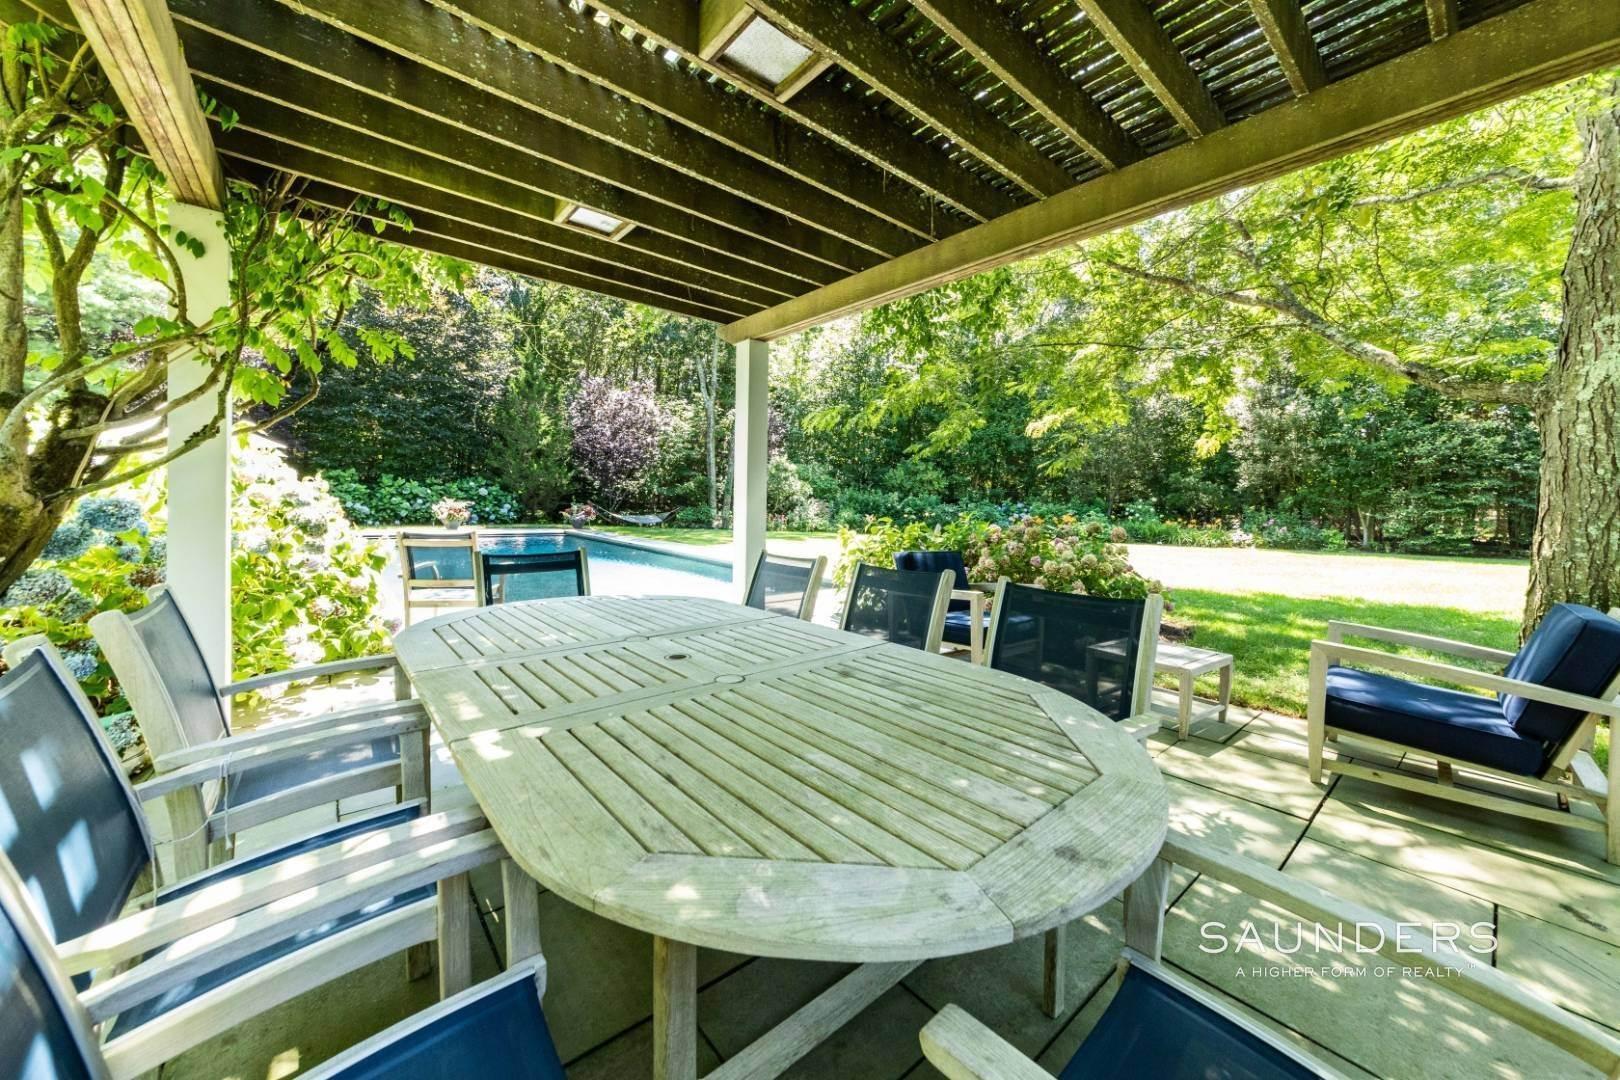 21. Single Family Homes for Sale at Wainscott South Traditional Near Beach Lane 10 Merriwood Drive, Wainscott, East Hampton Town, NY 11975